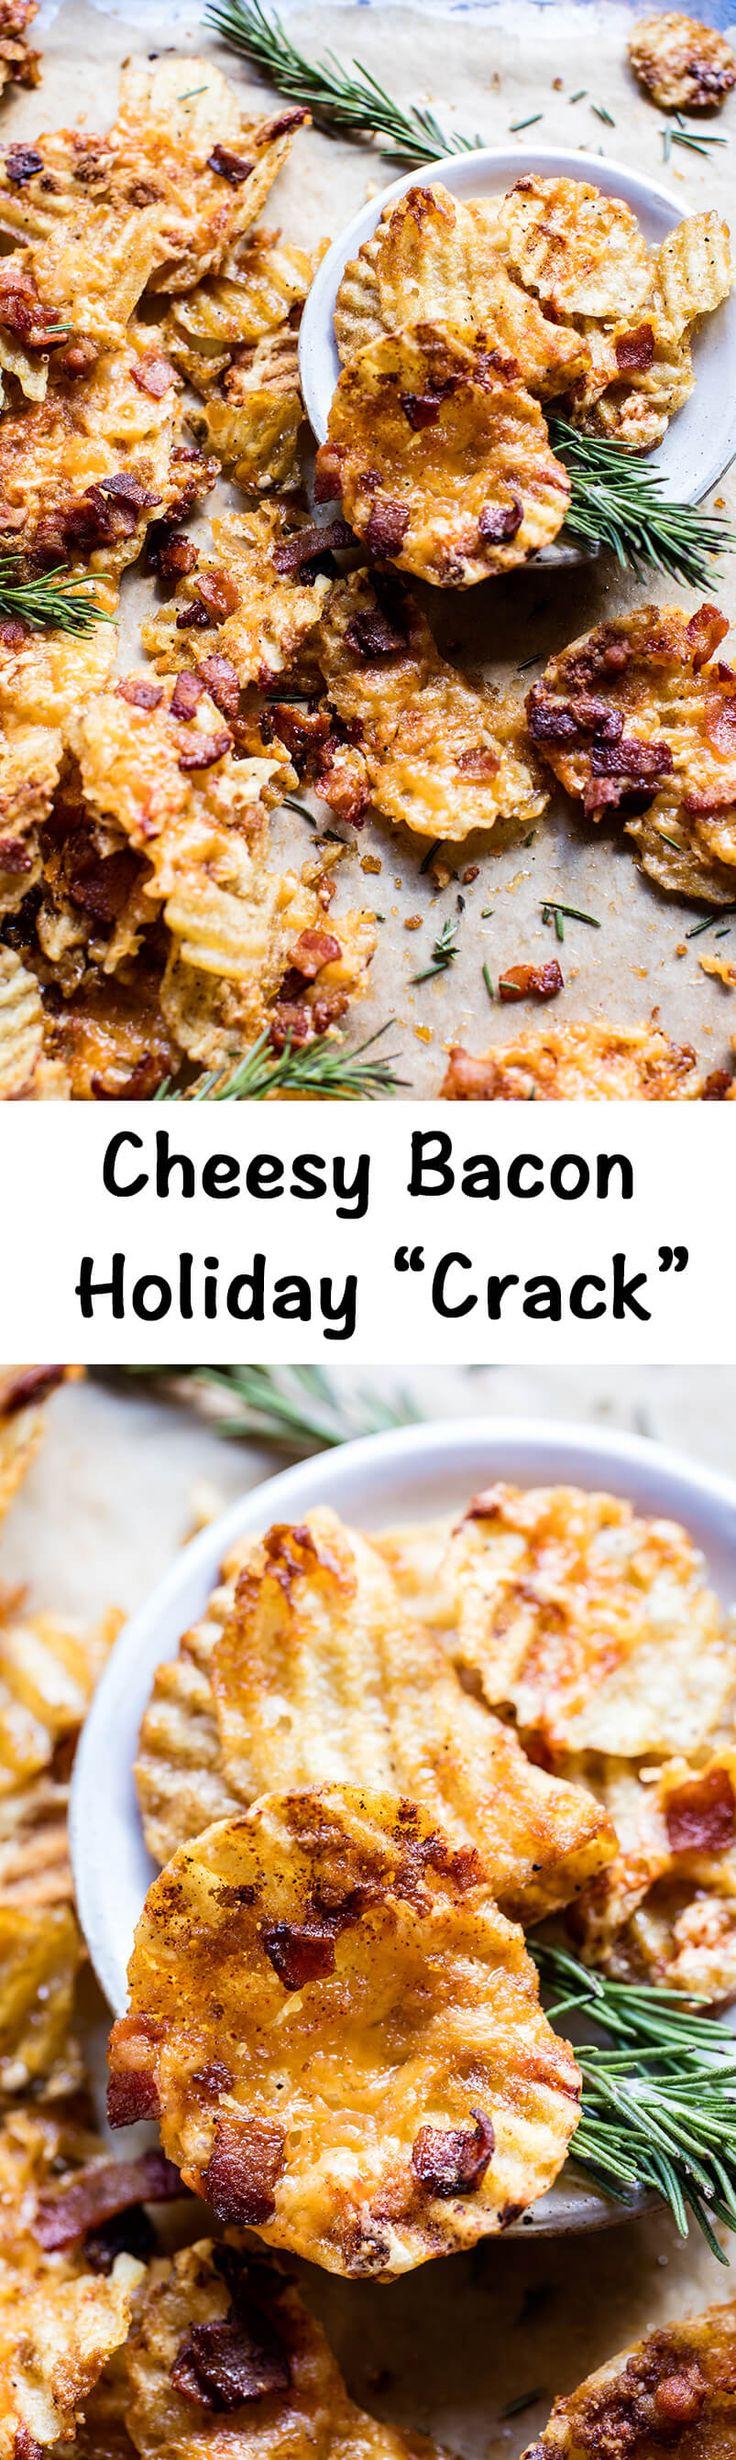 Cheesy Bacon Holiday Crack | halfbakedharvest.com @hbharvest